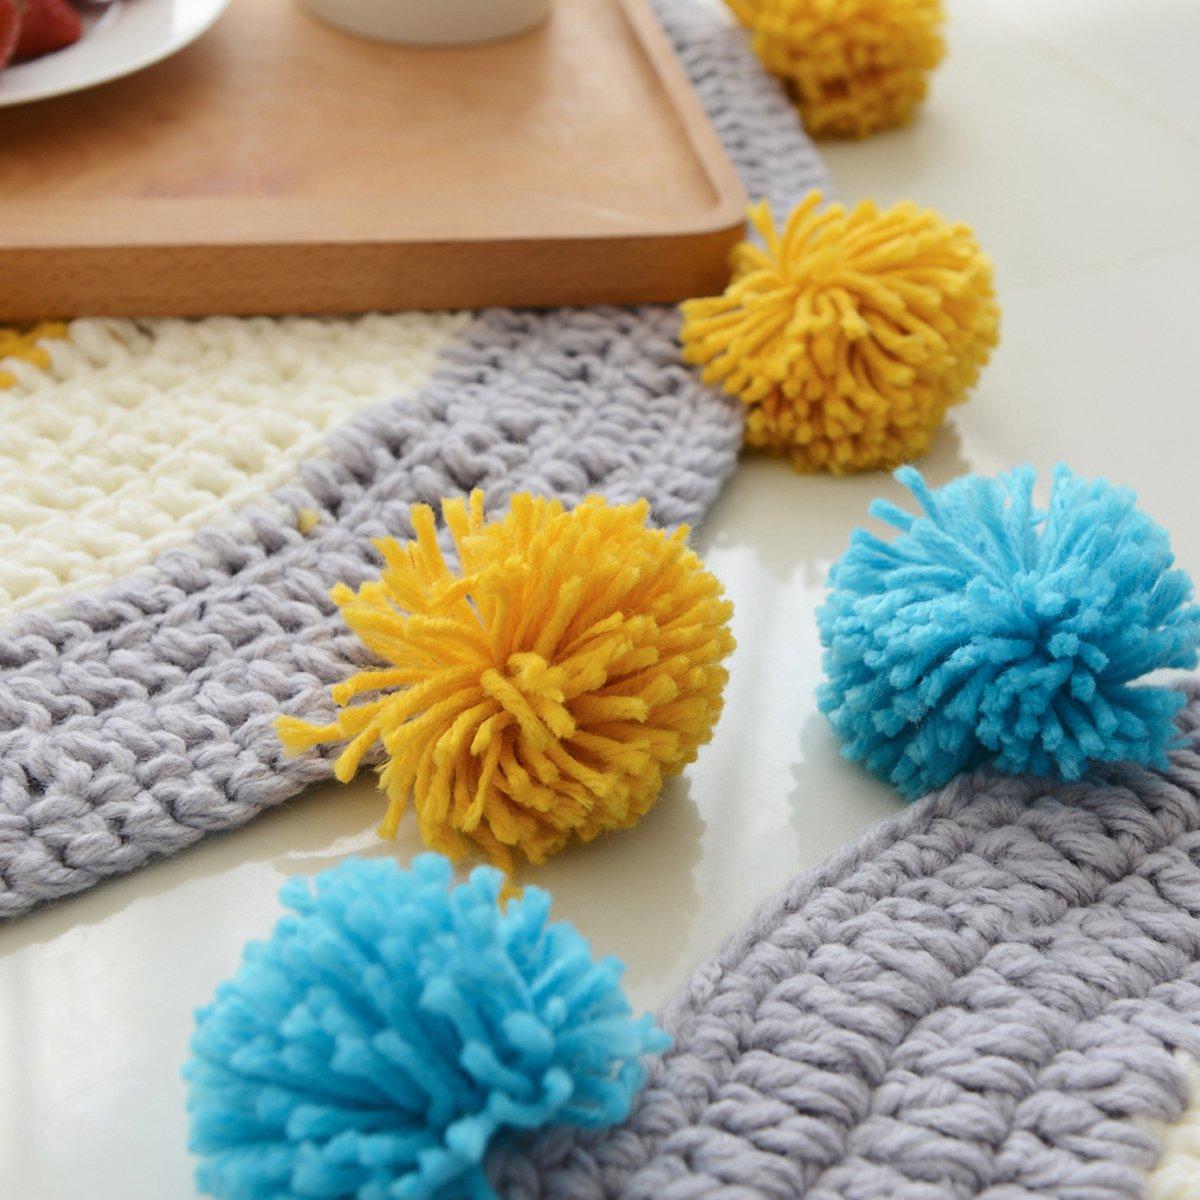 MYLUNE HOME Modern Round Knit Area Rug Carpet Mats Blanket for Bedroom Living Room Sofa Table Carpet (blue)